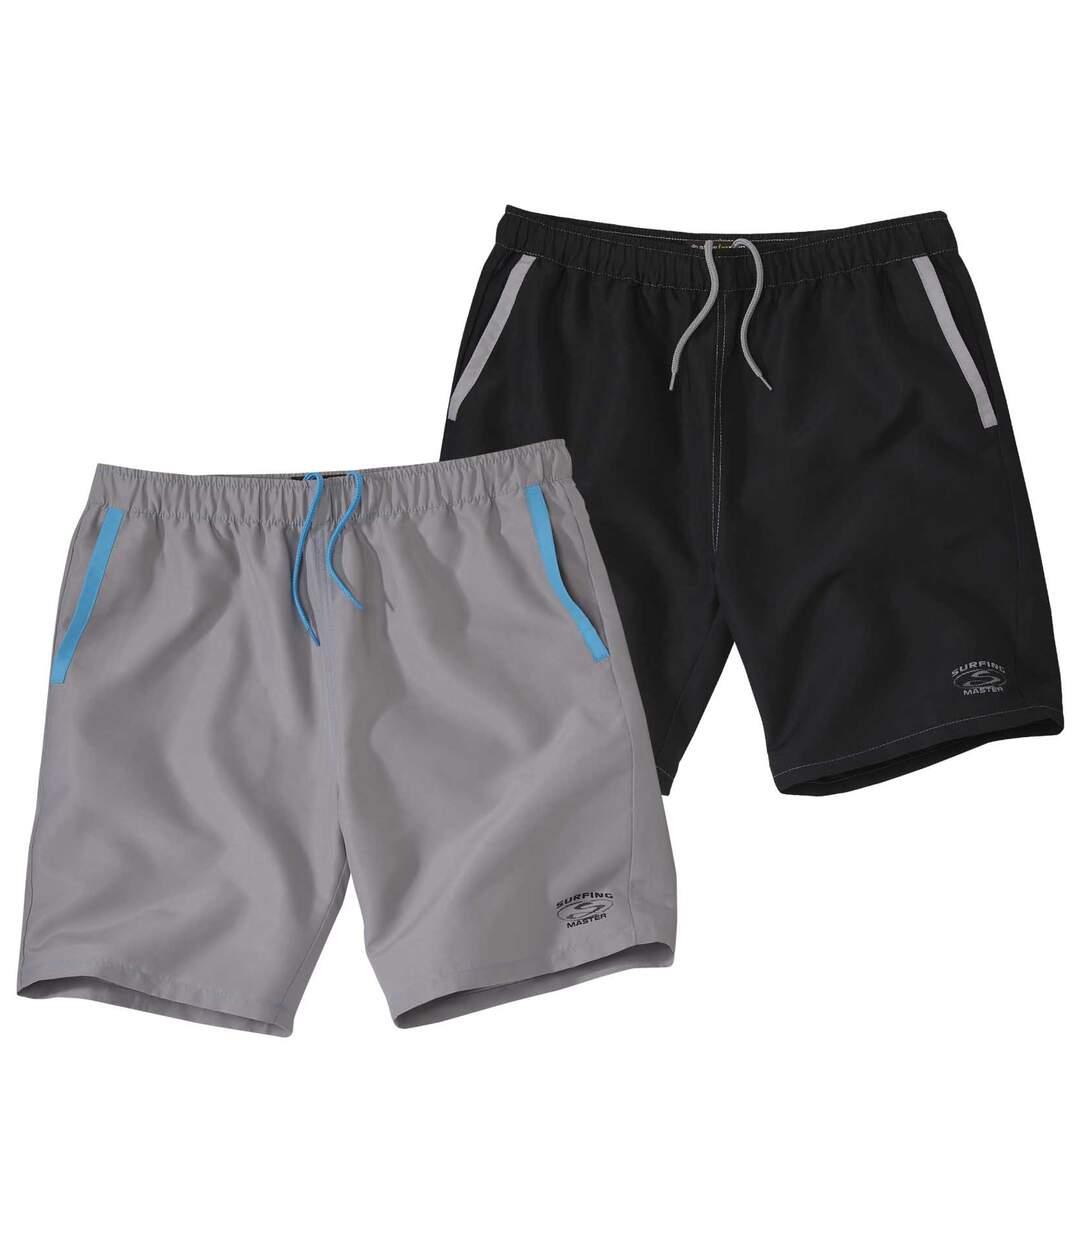 Pack of 2 Men's Microfibre Surf Shorts - Black Grey